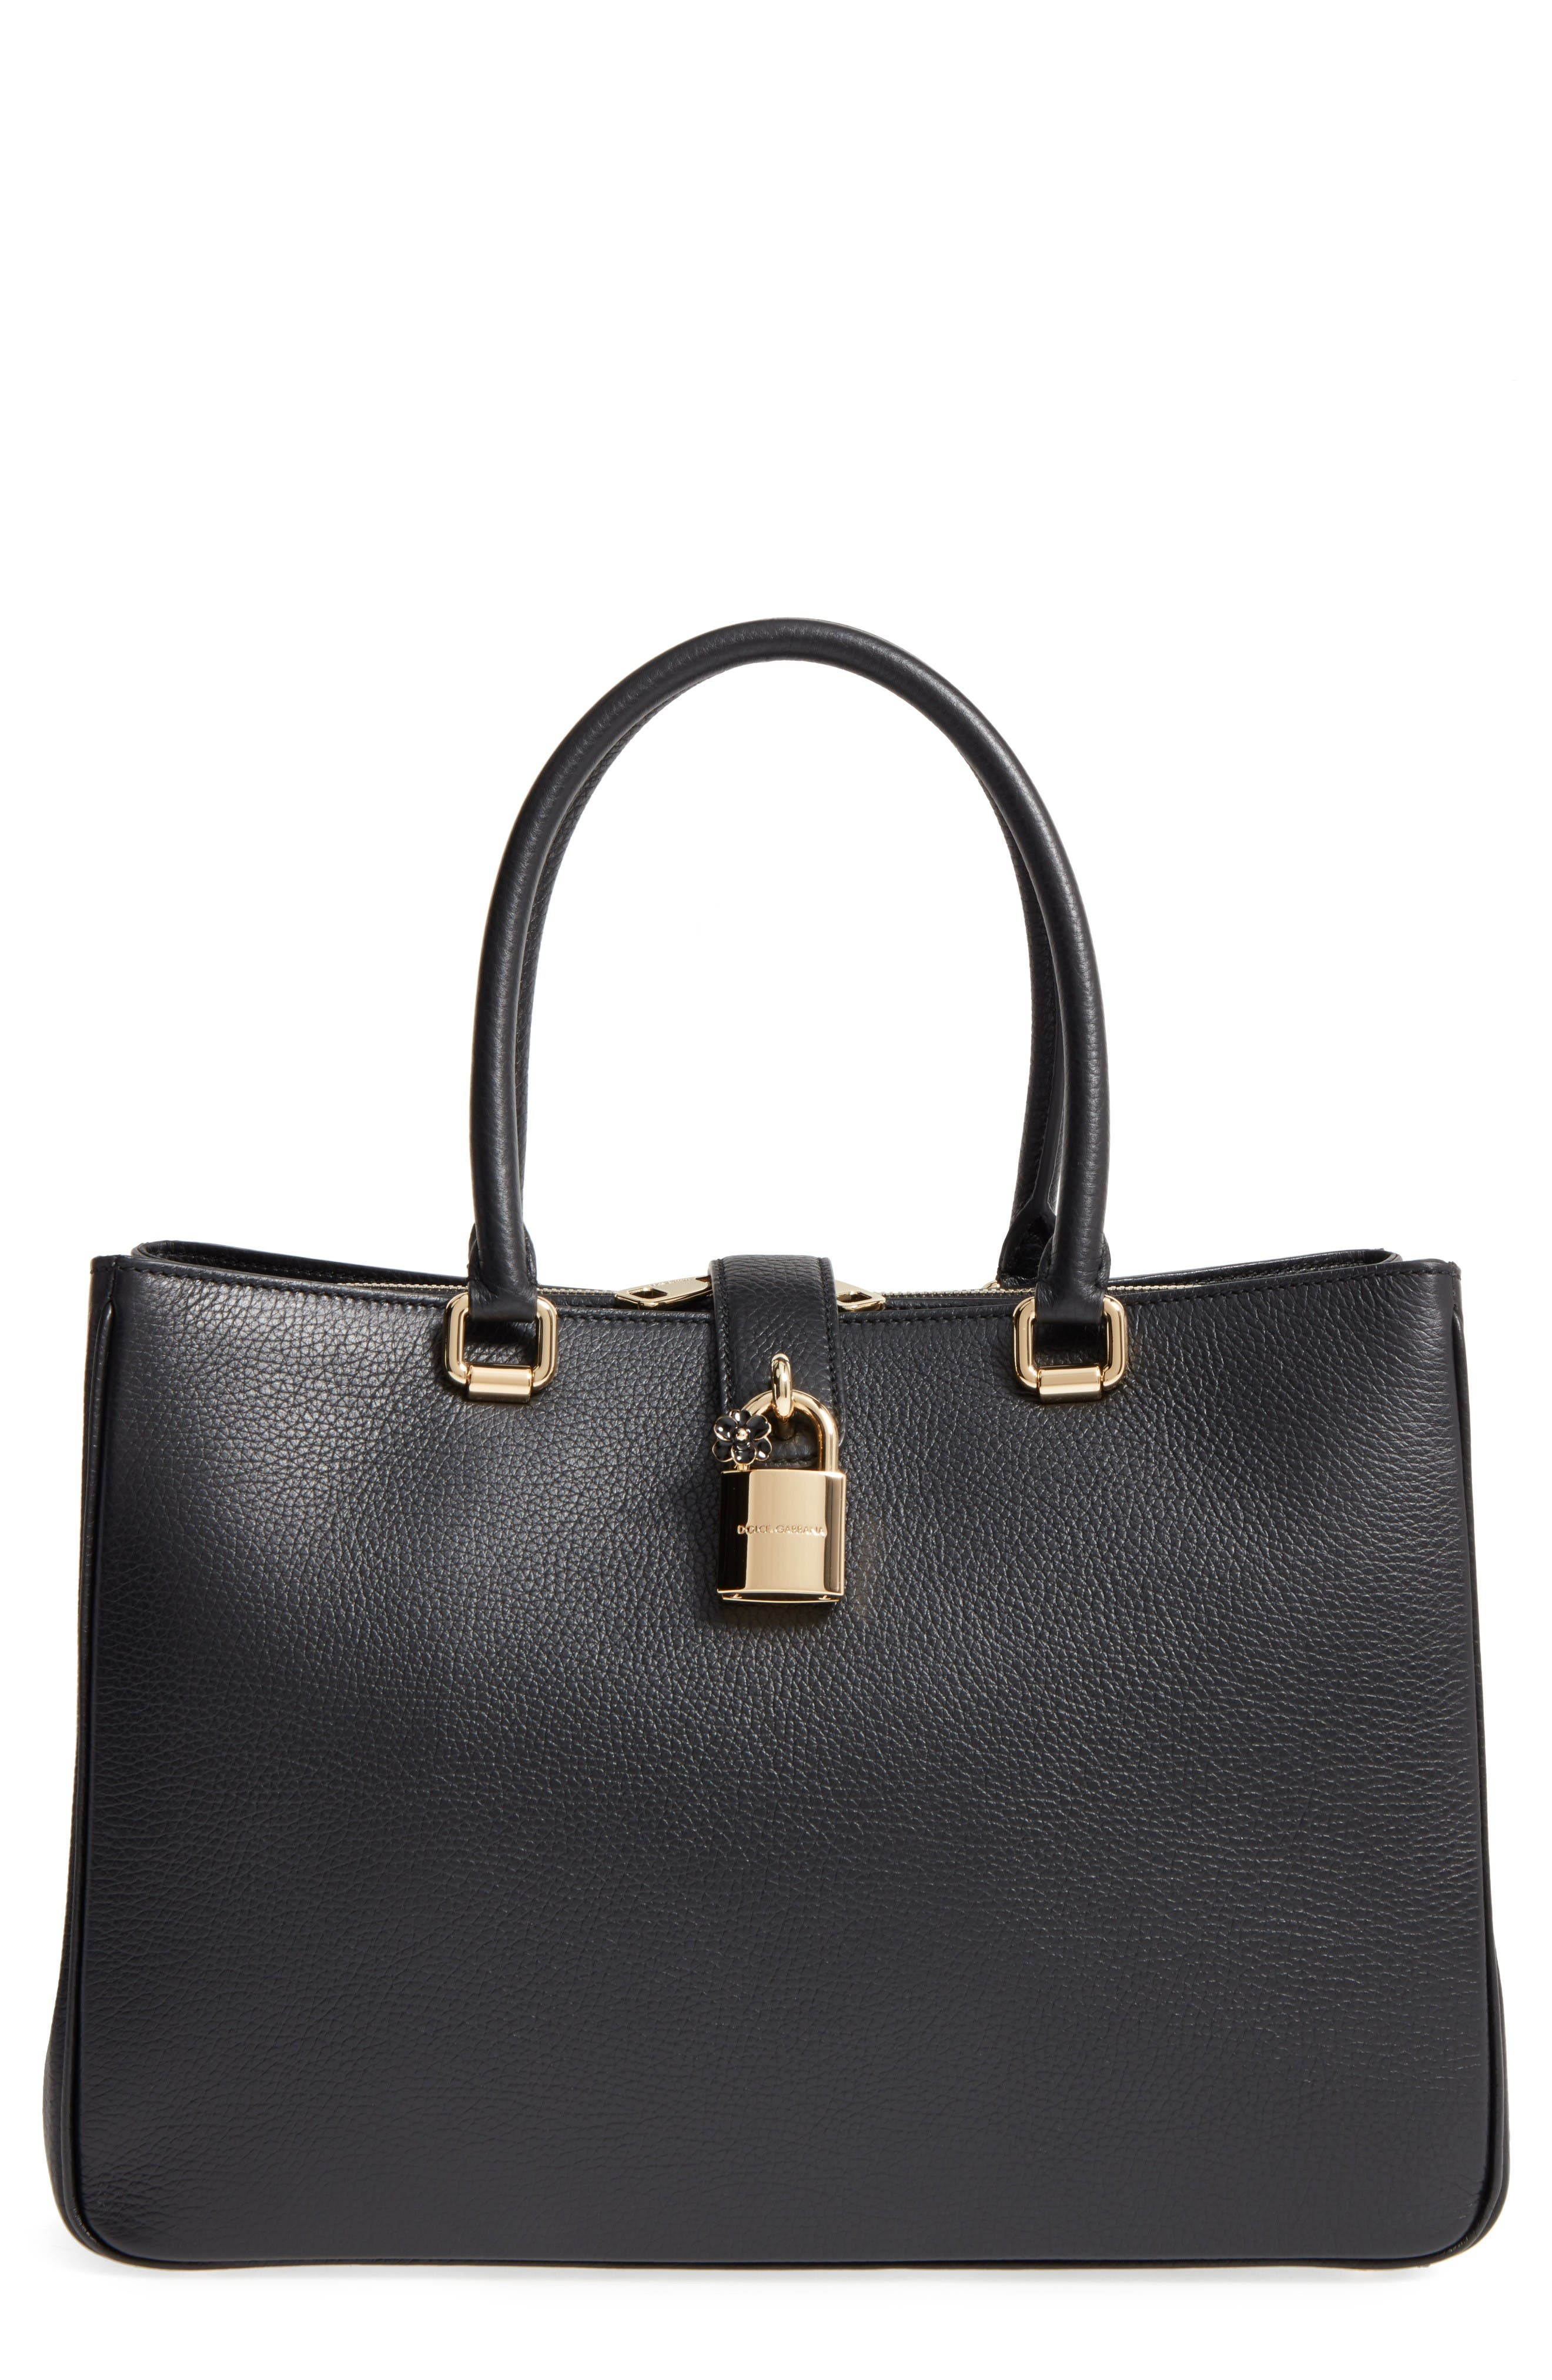 Dolce&Gabbana Grained Leather Shopper